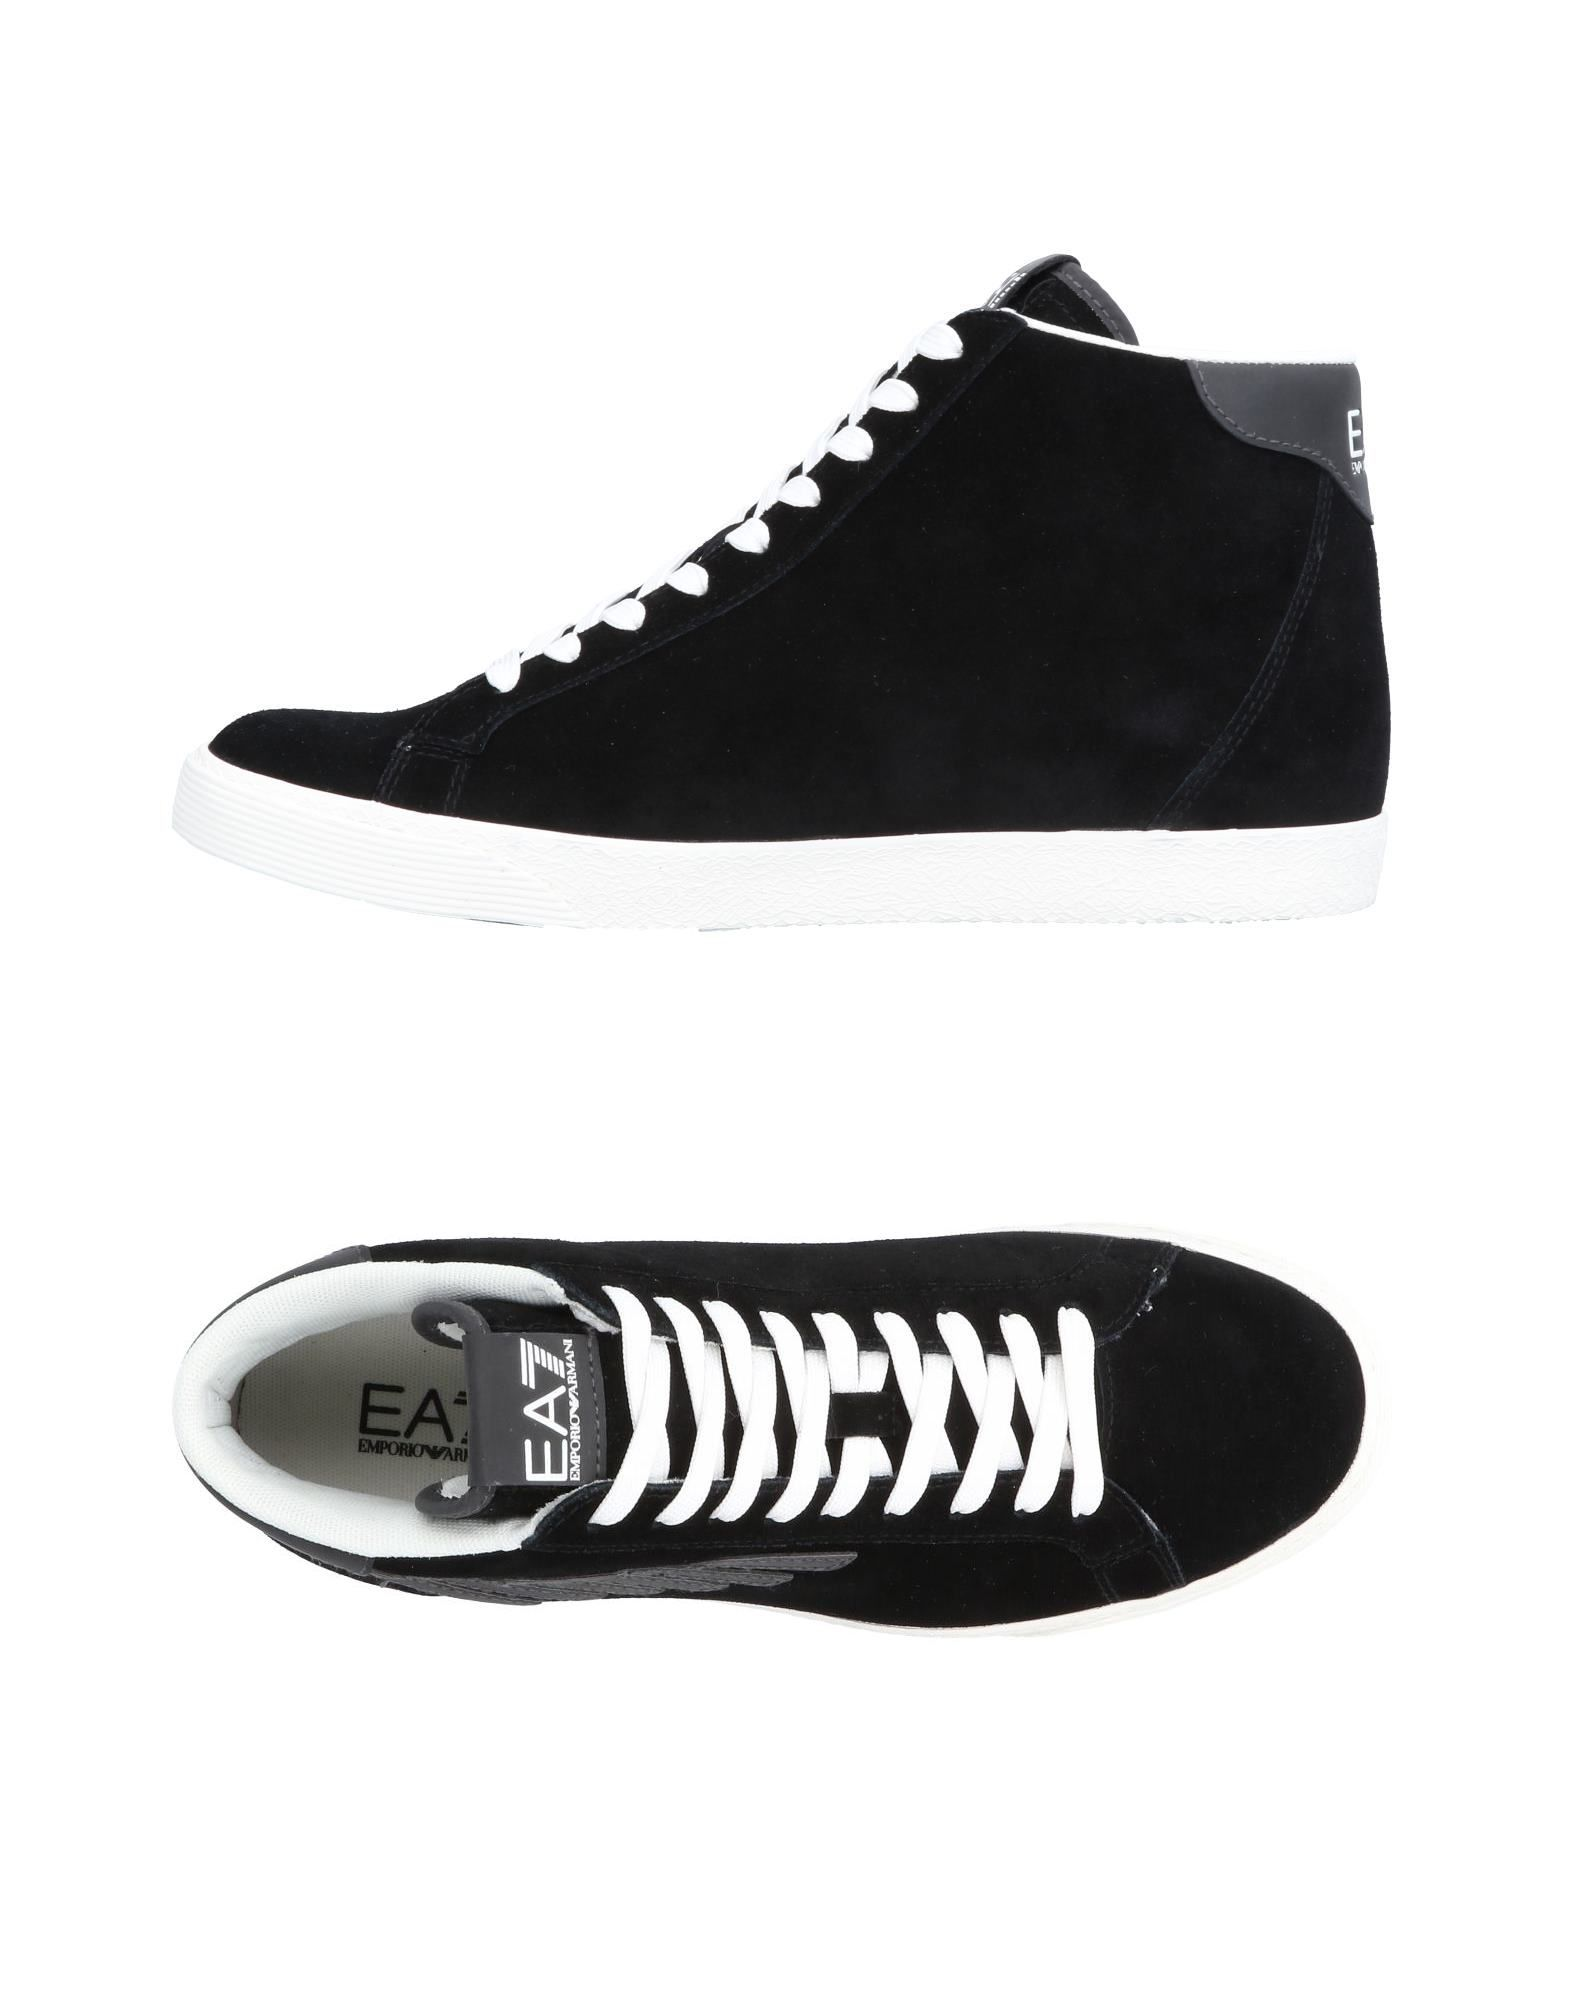 Emporio Armani Sneakers Herren  11499035UJ Gute Qualität beliebte Schuhe